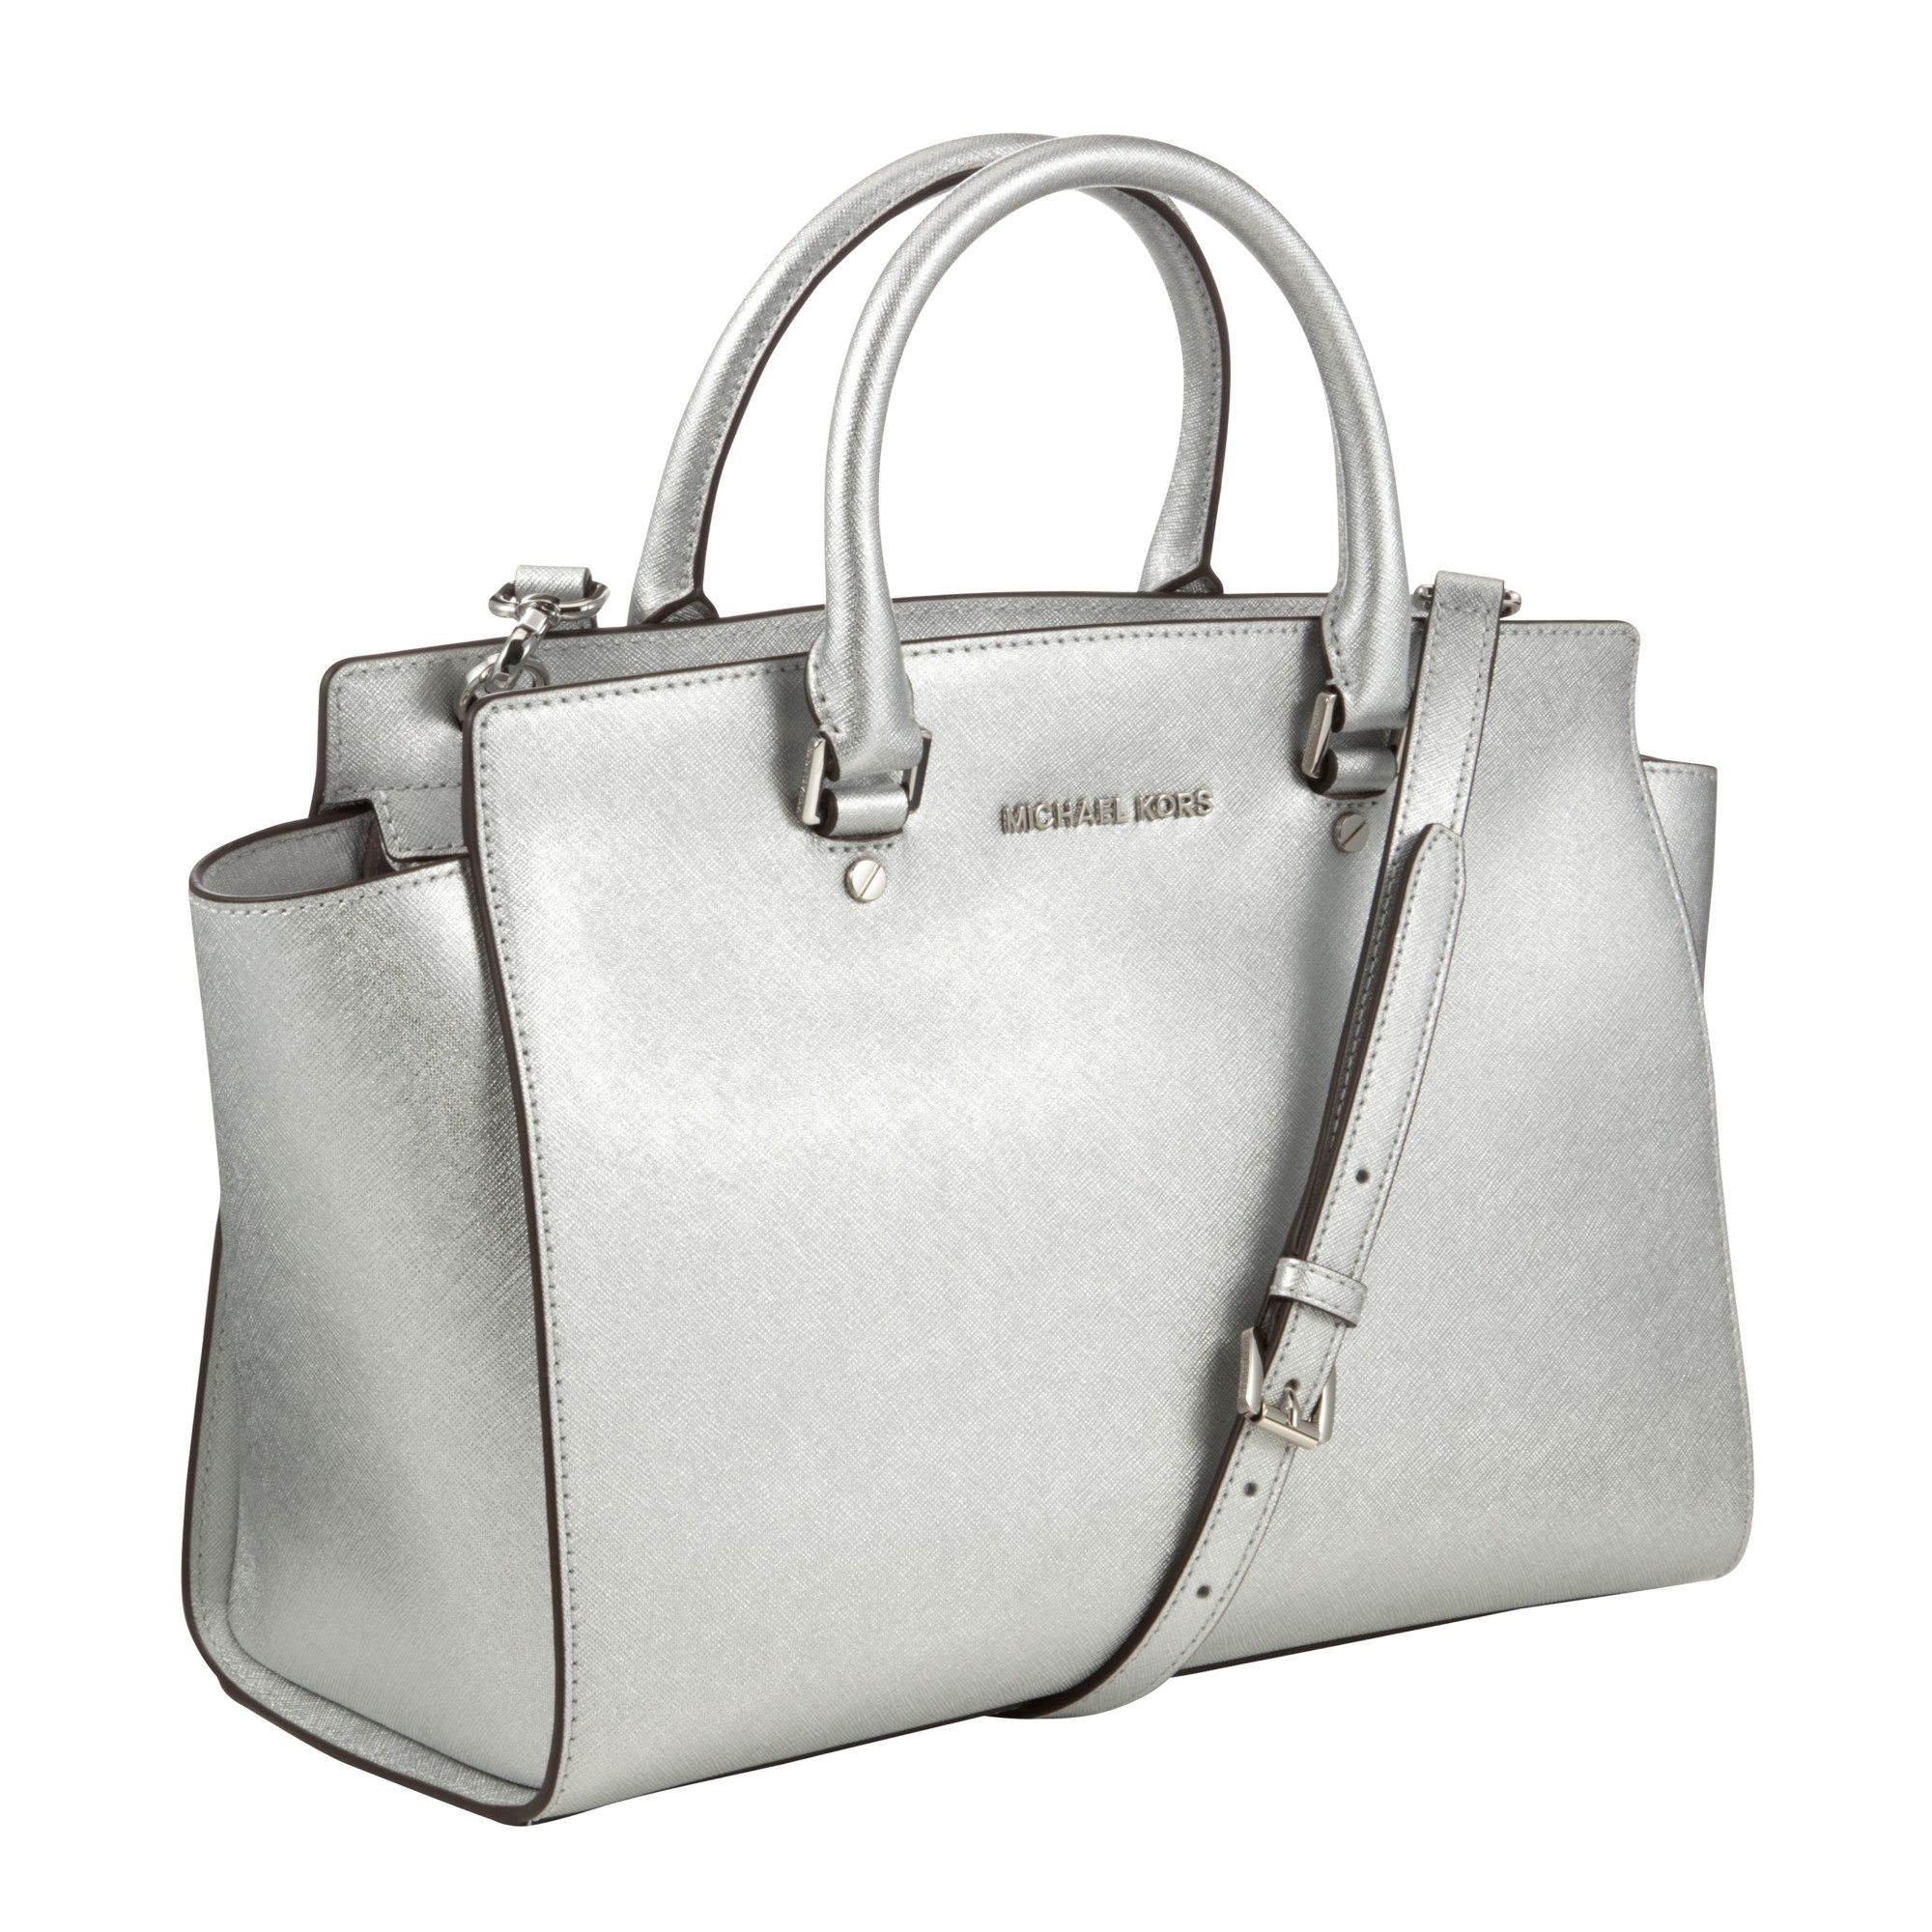 6c6bcf7294f6 MICHAEL Michael Kors Selma Leather Satchel Bag in Metallic - Lyst